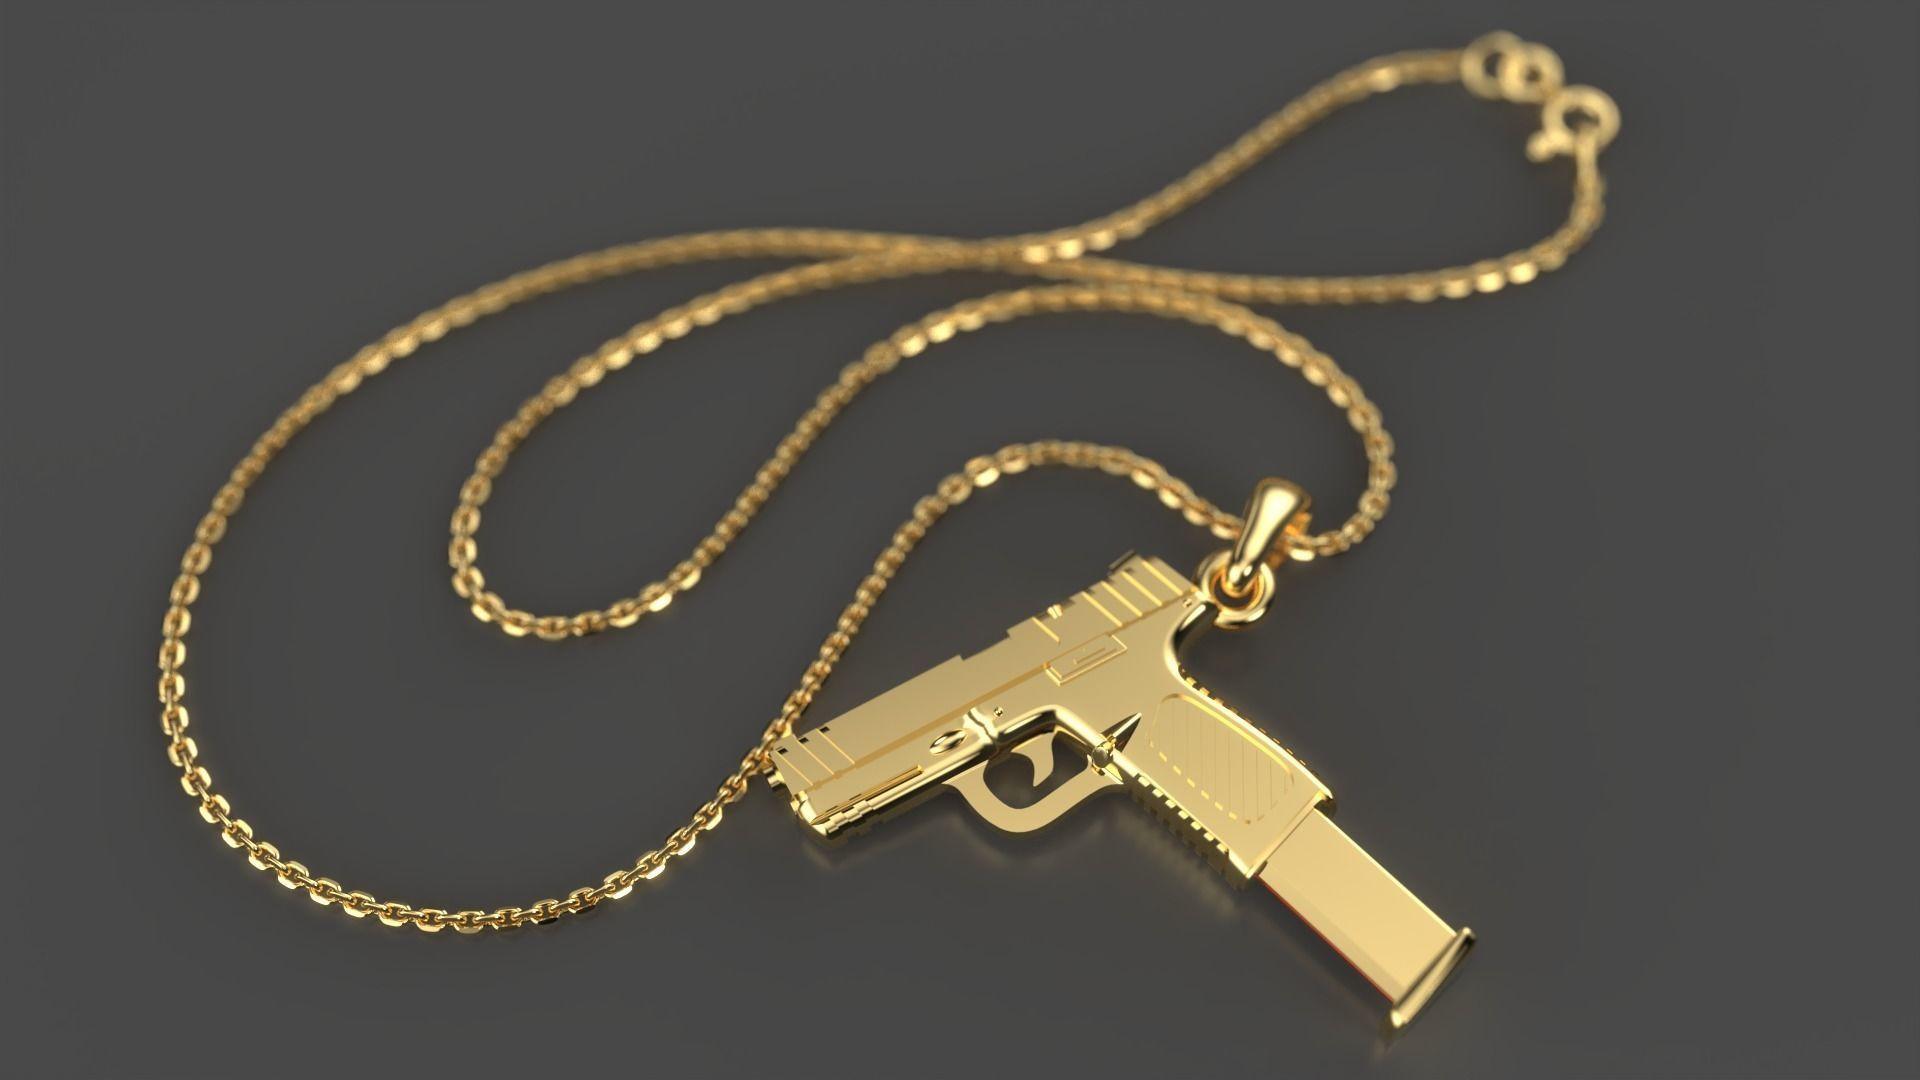 Smith and Wesson gun pendant